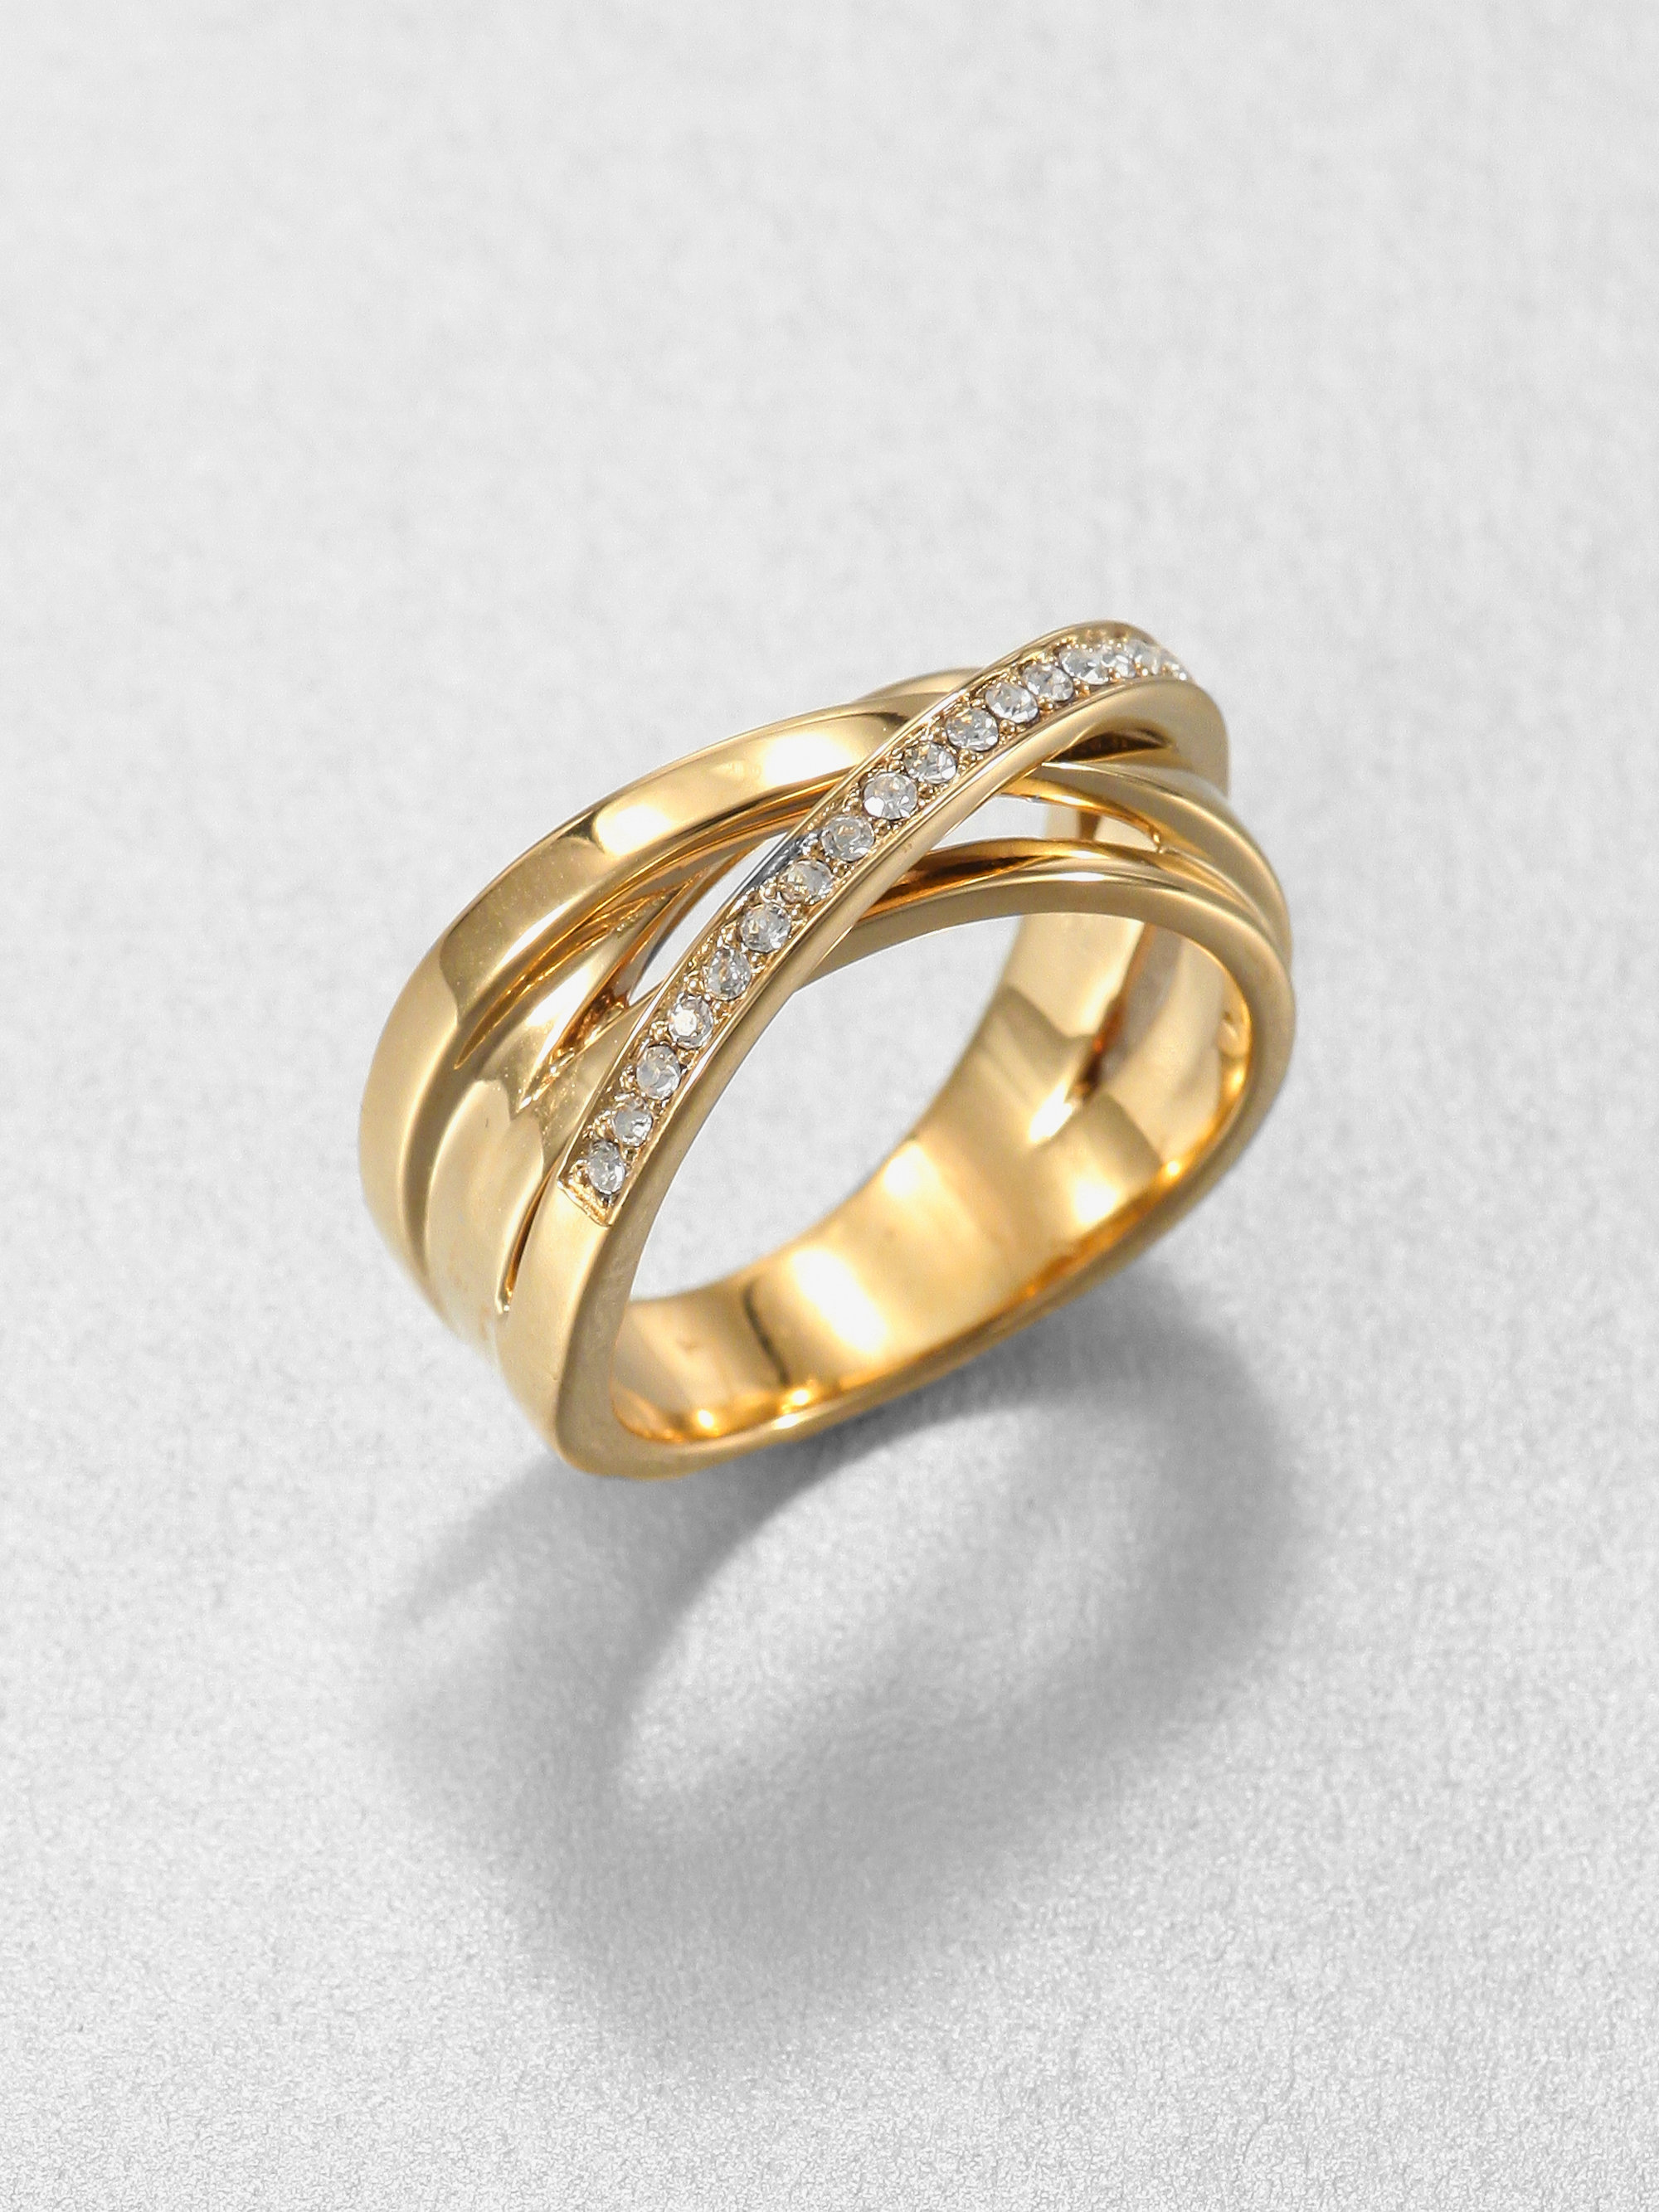 Michael Kors Pav Twisted Ring In Metallic Lyst